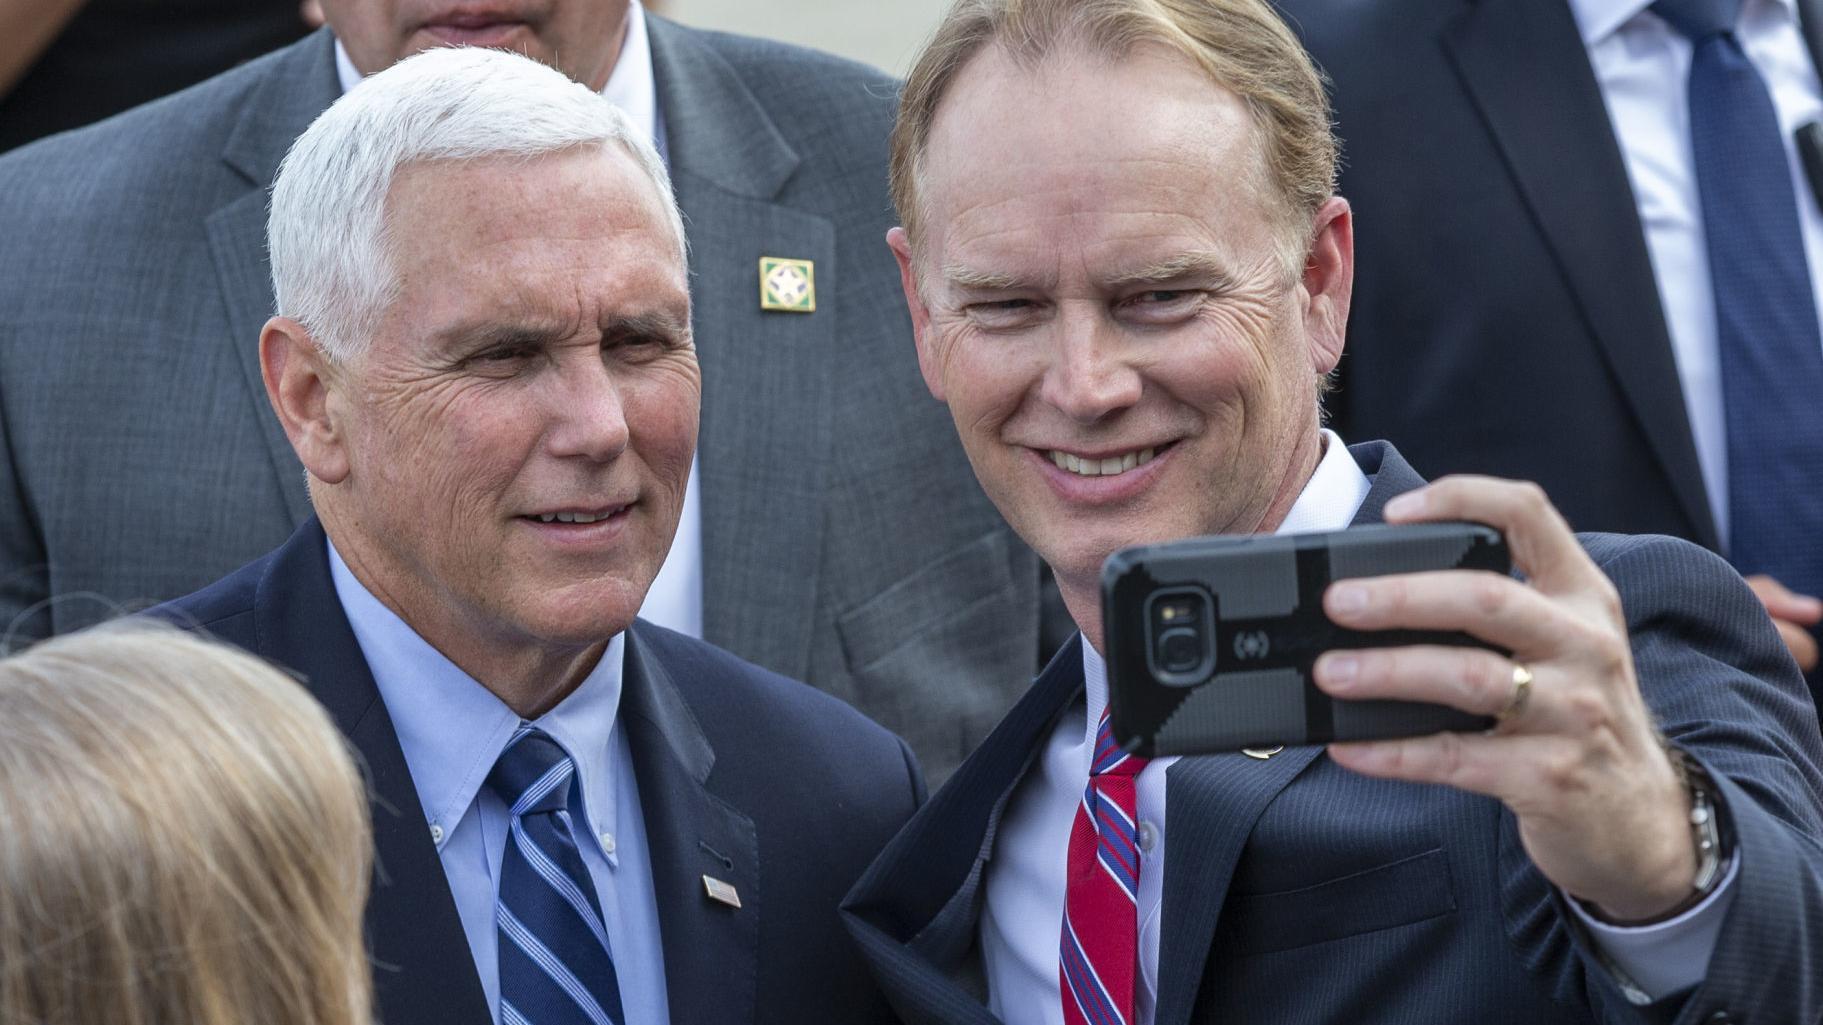 Vice President Mike Pence visits Greensboro for Tillis fundraiser